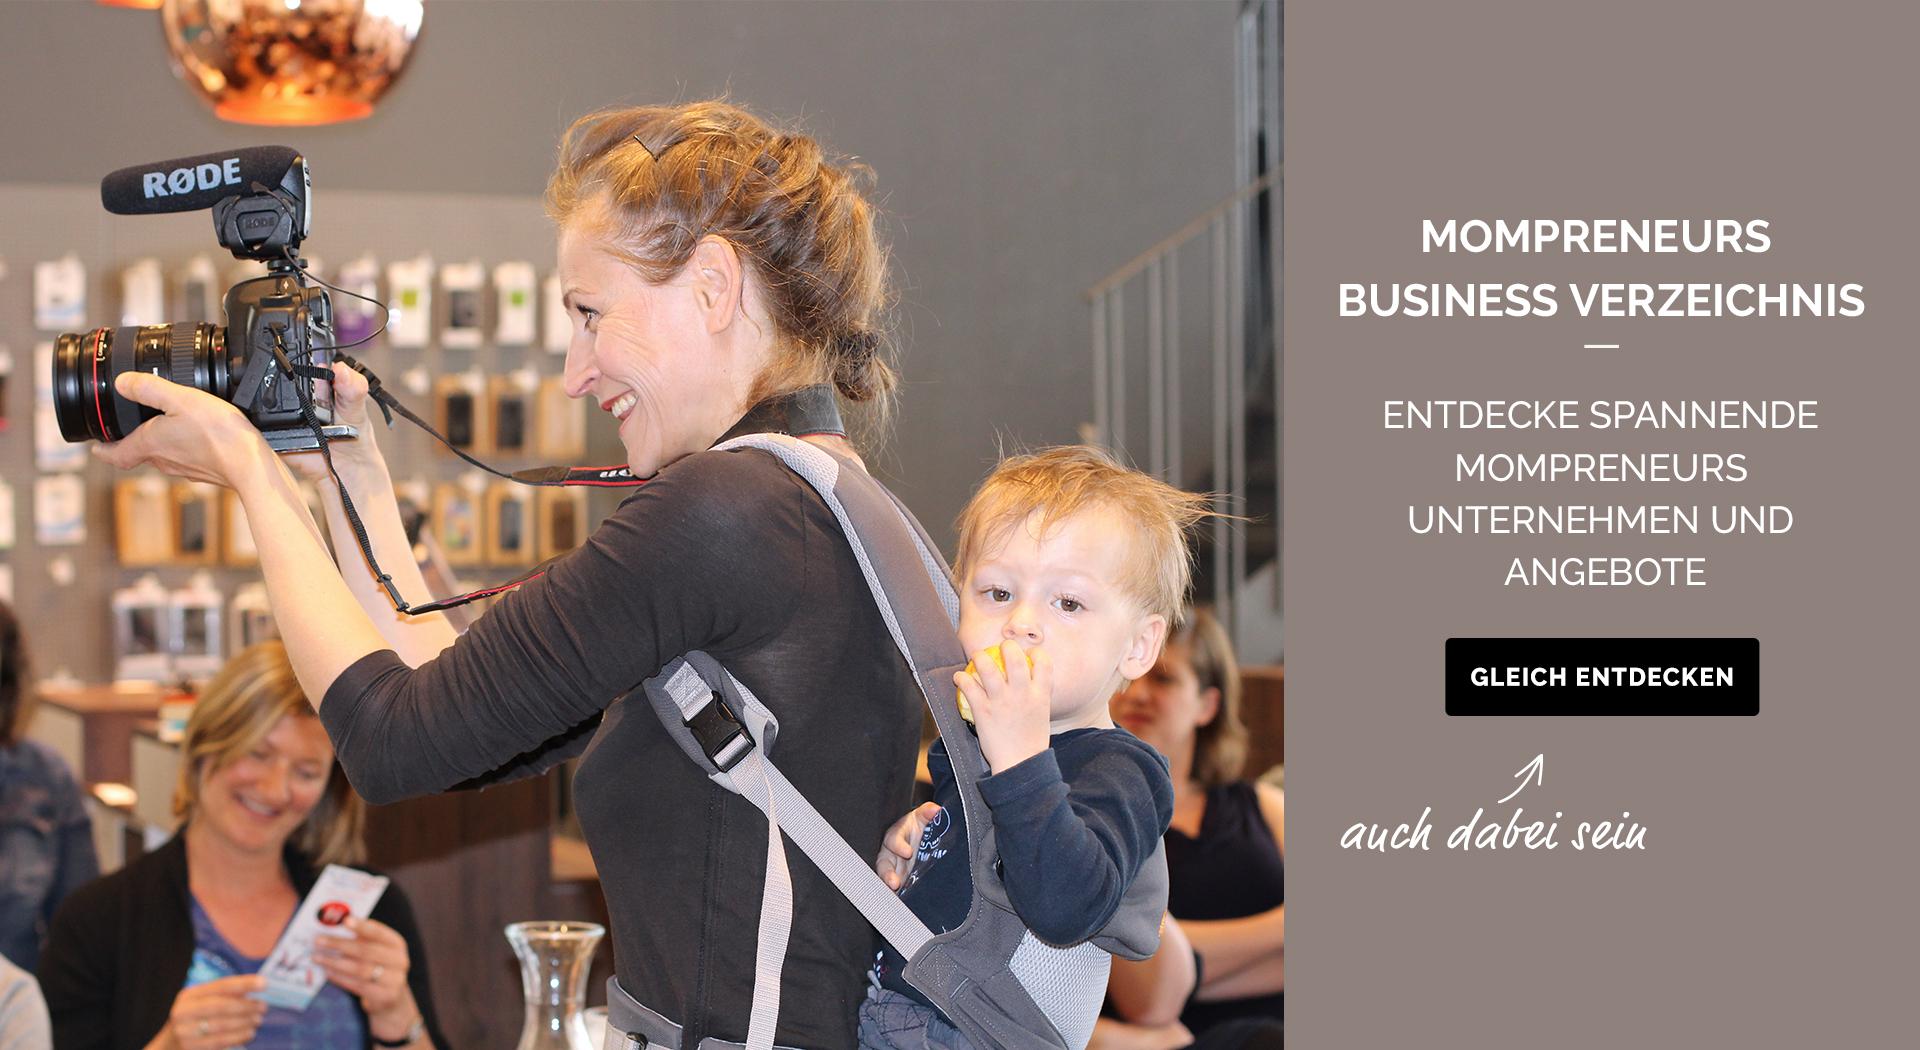 MomPreneurs-Business